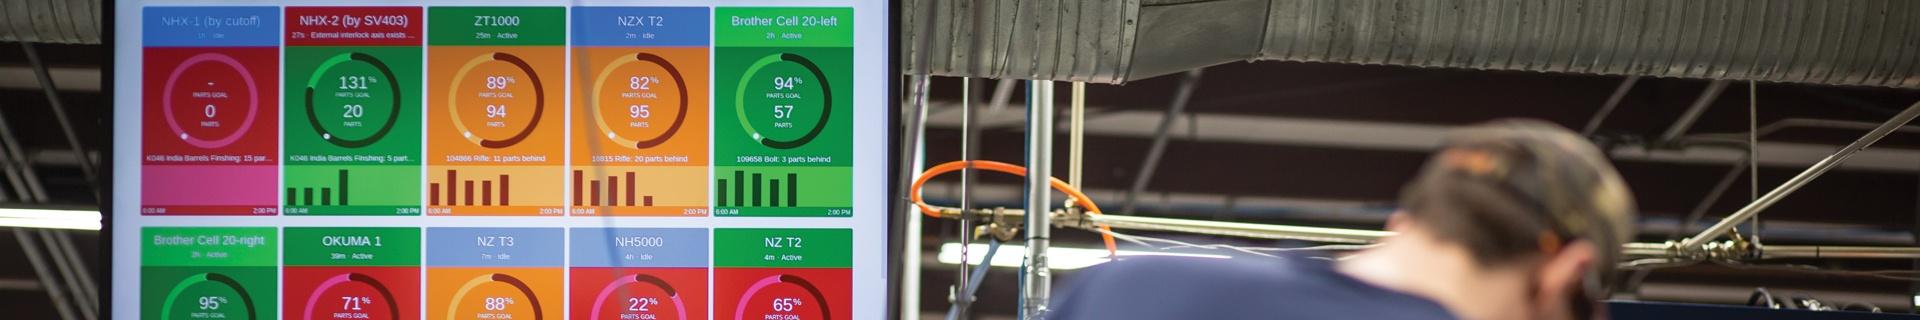 Real Time Machine Monitoring Dashboards | MachineMetrics